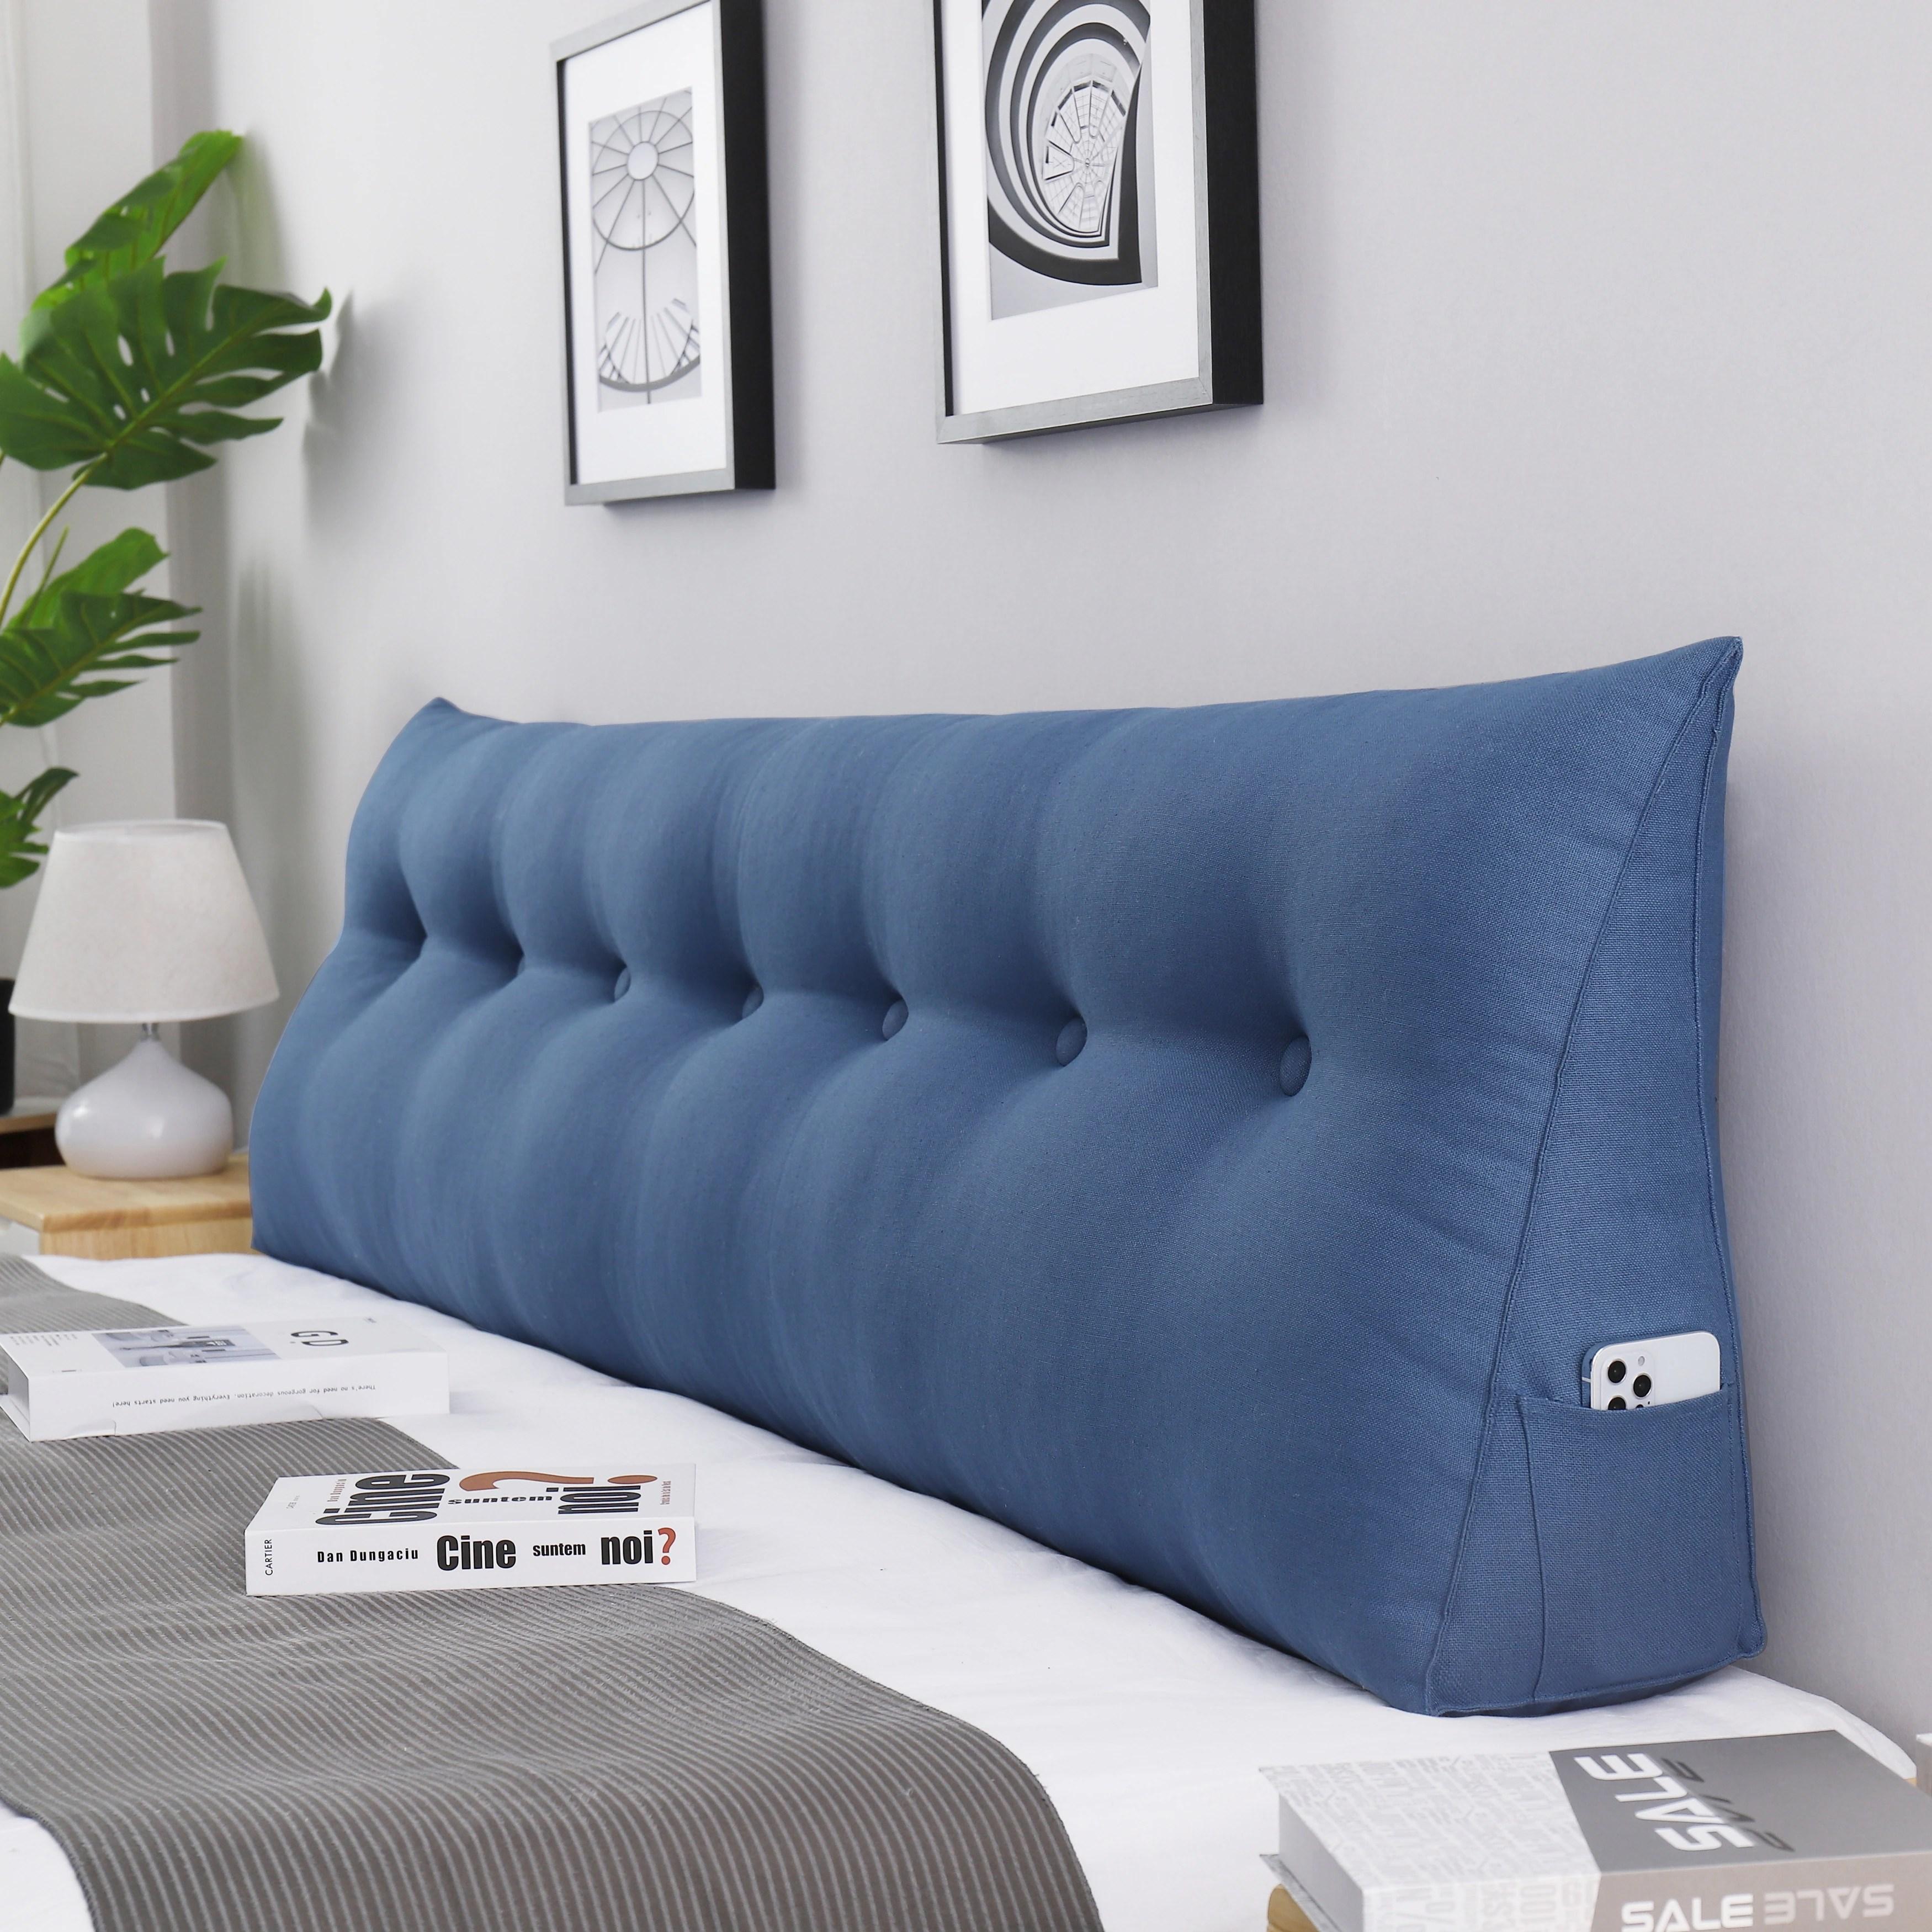 wowmax bed rest wedge pillow oversized extra long back lumbar pillow